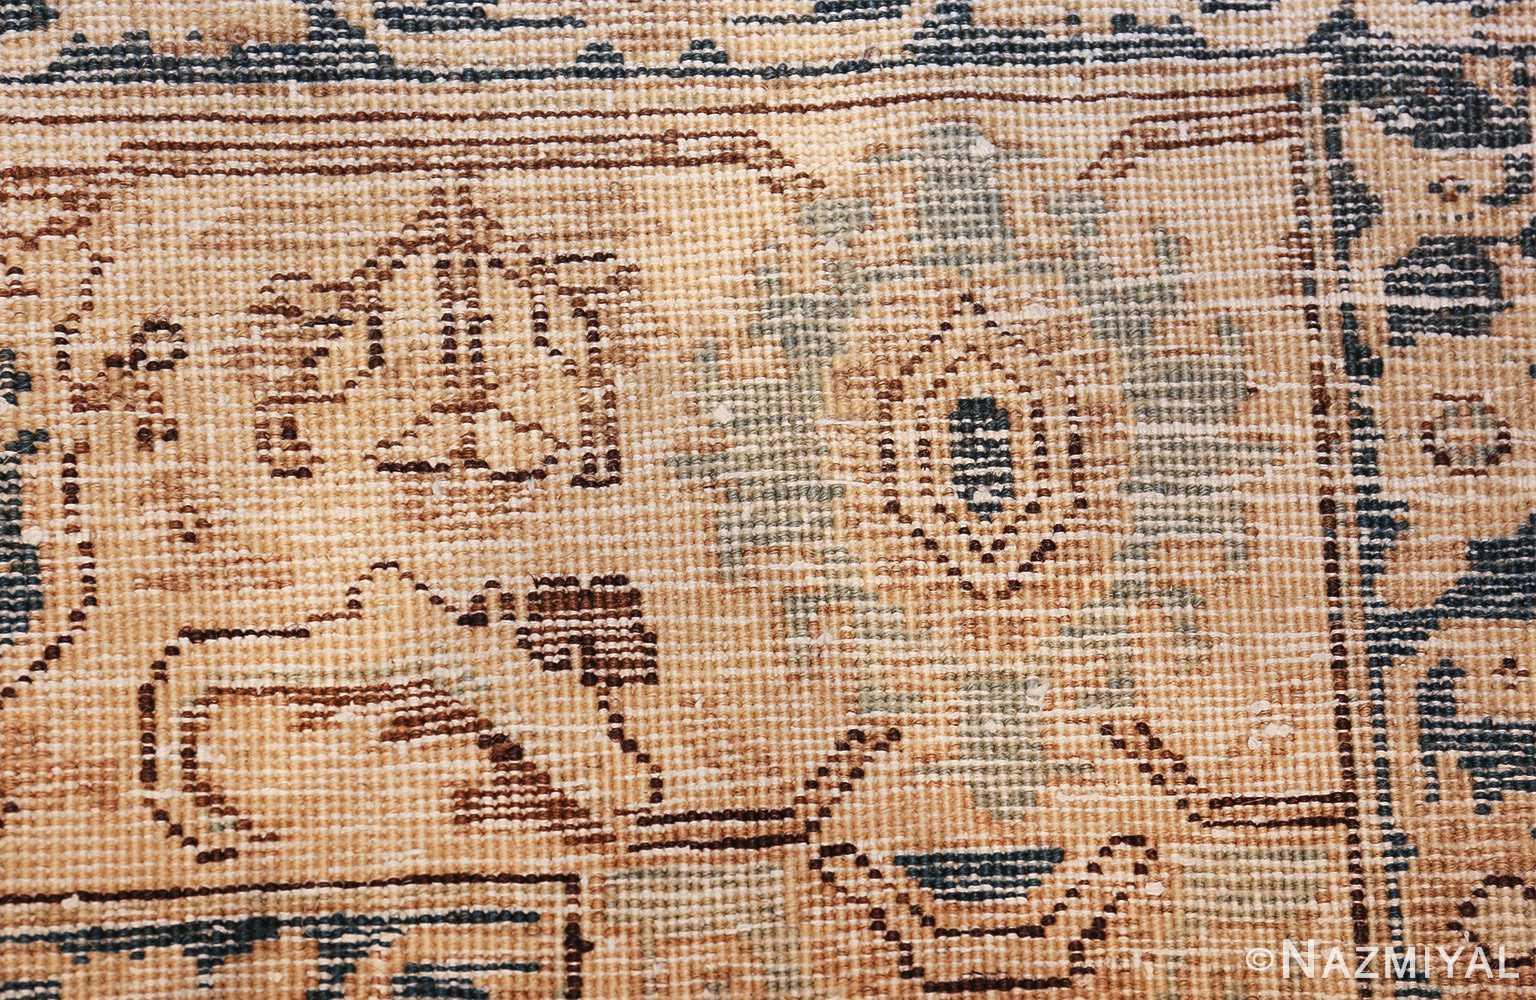 decorative neutral antique room size persian tabriz rug 49666 knots Nazmiyal